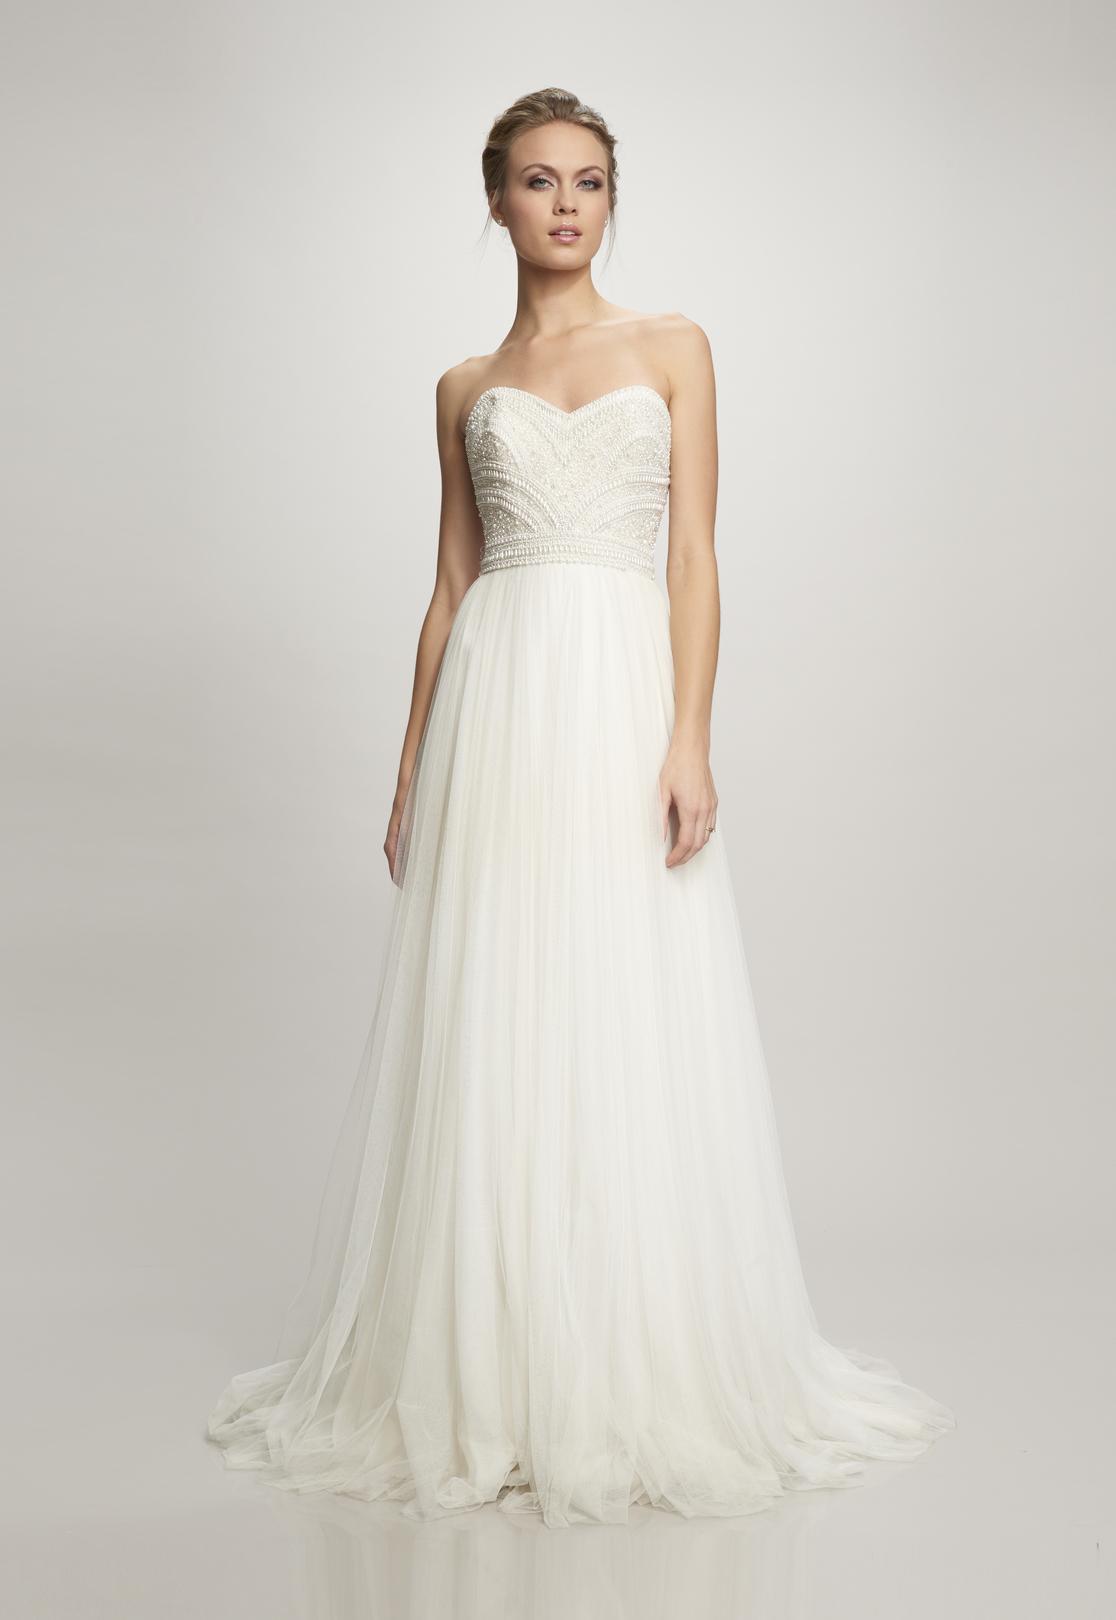 Dress main 2x 1547039826